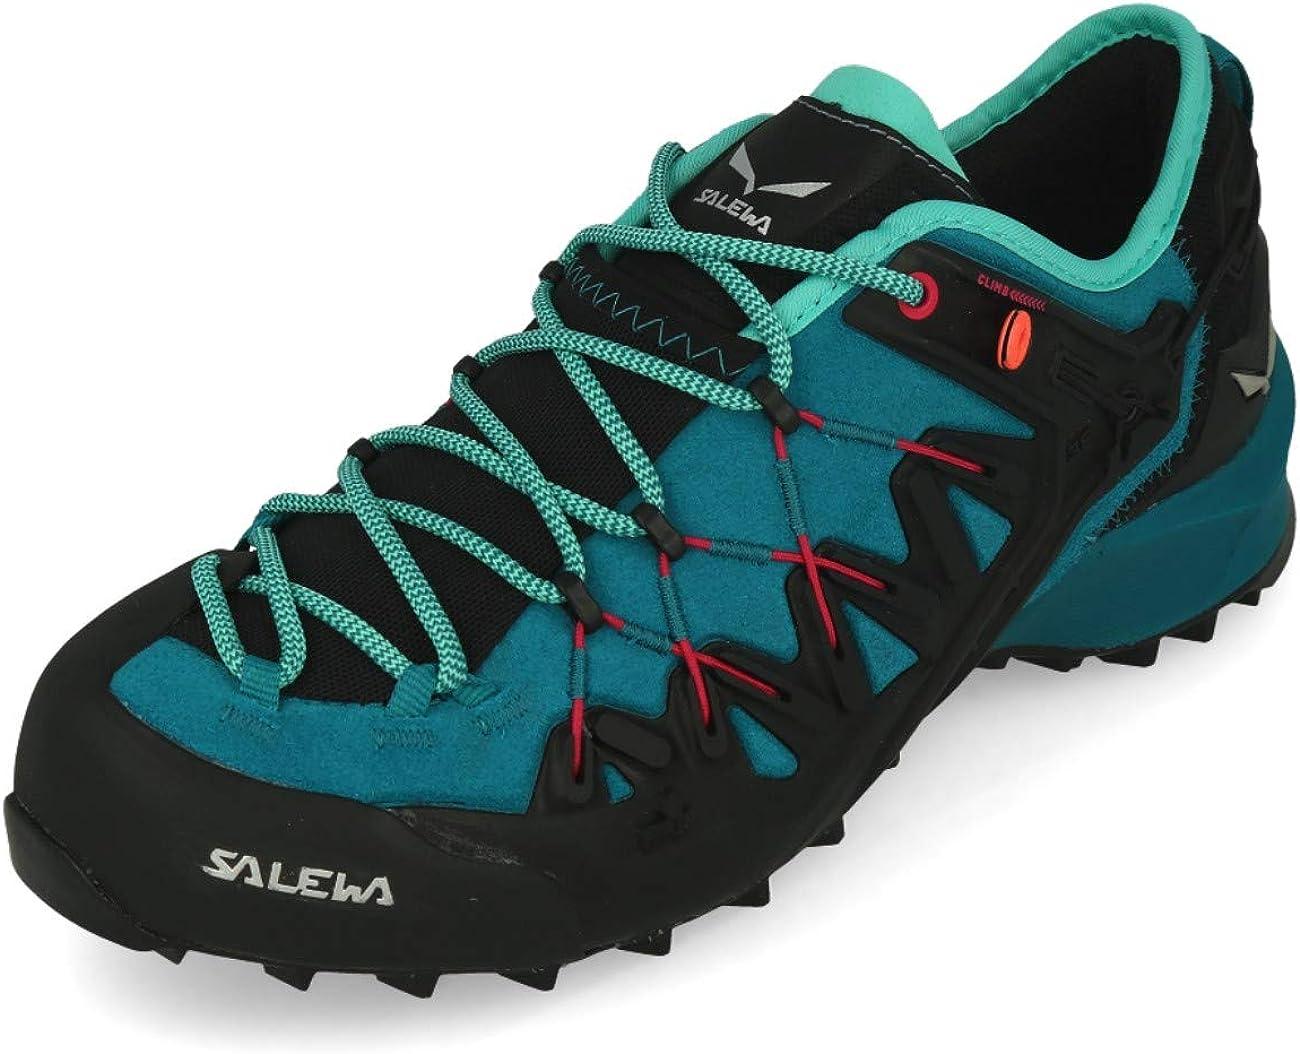 Salewa Wildfire 《週末限定タイムセール》 Edge Hiking 完売 Shoe Women's -